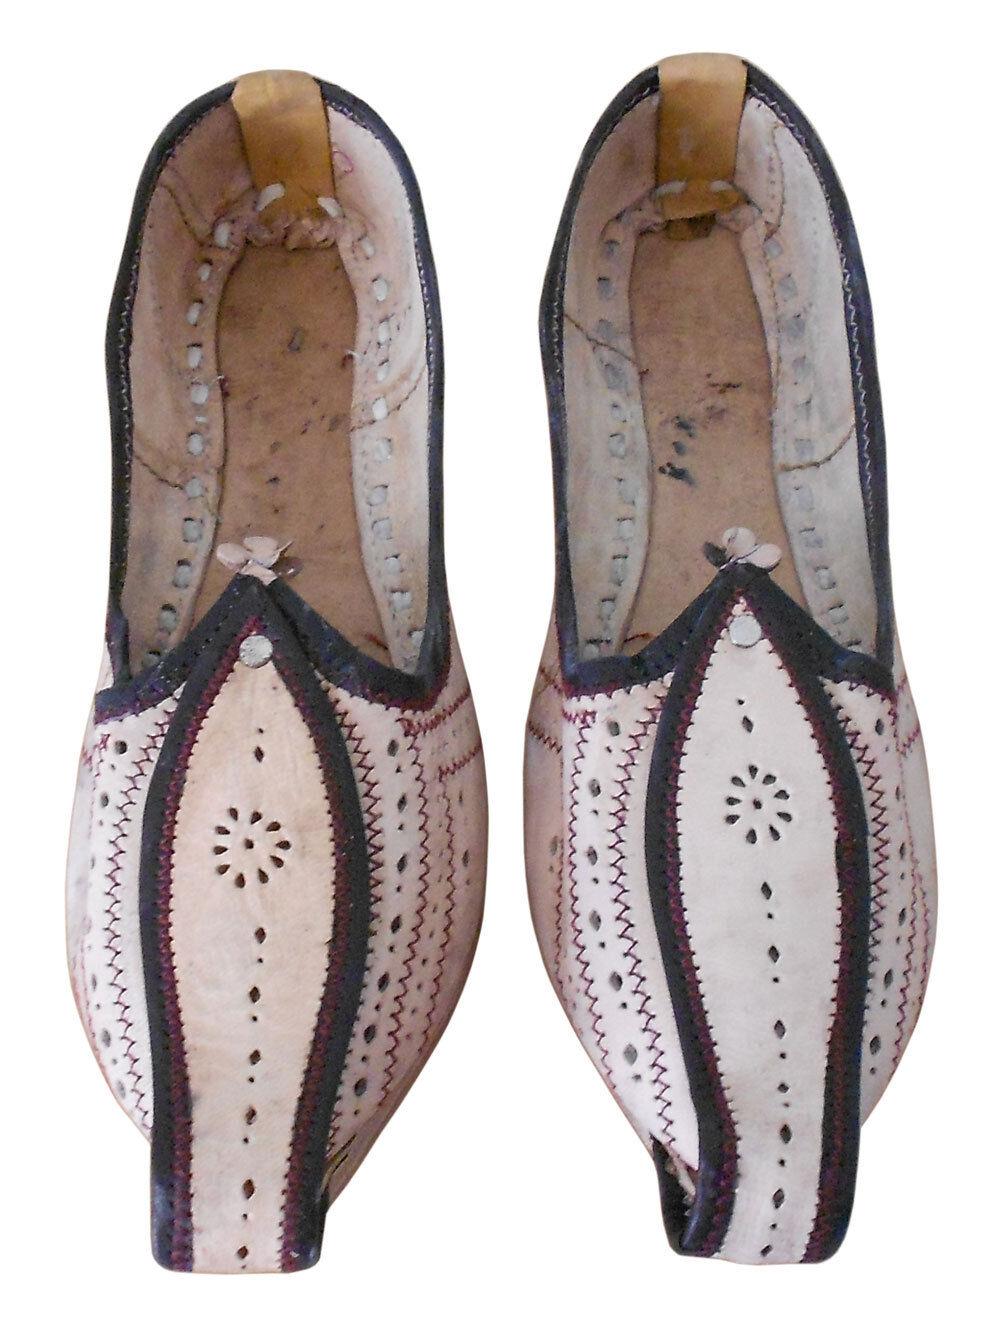 Men shoes Jutti Traditional Leather Cream Indian Espadrilles Mojari US 8